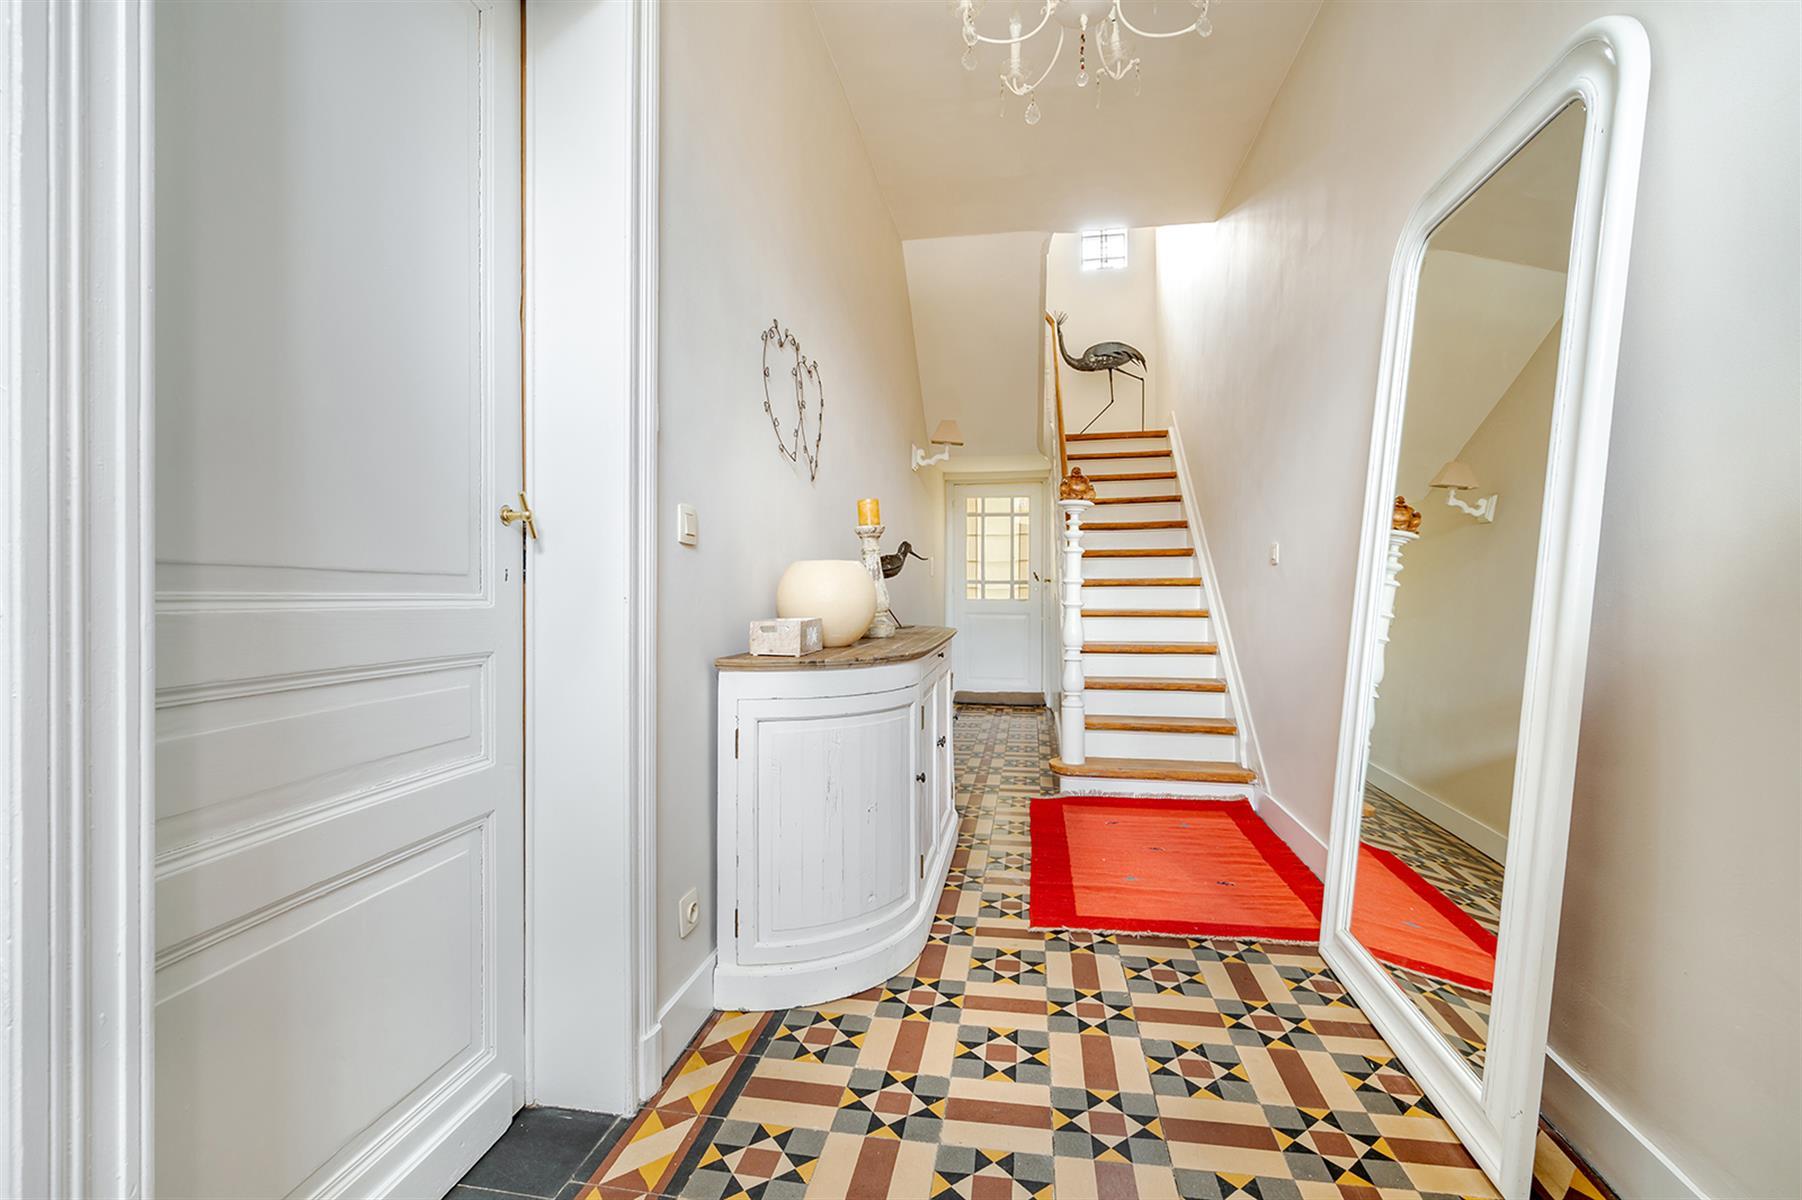 Maison - Hannut - #4342124-4